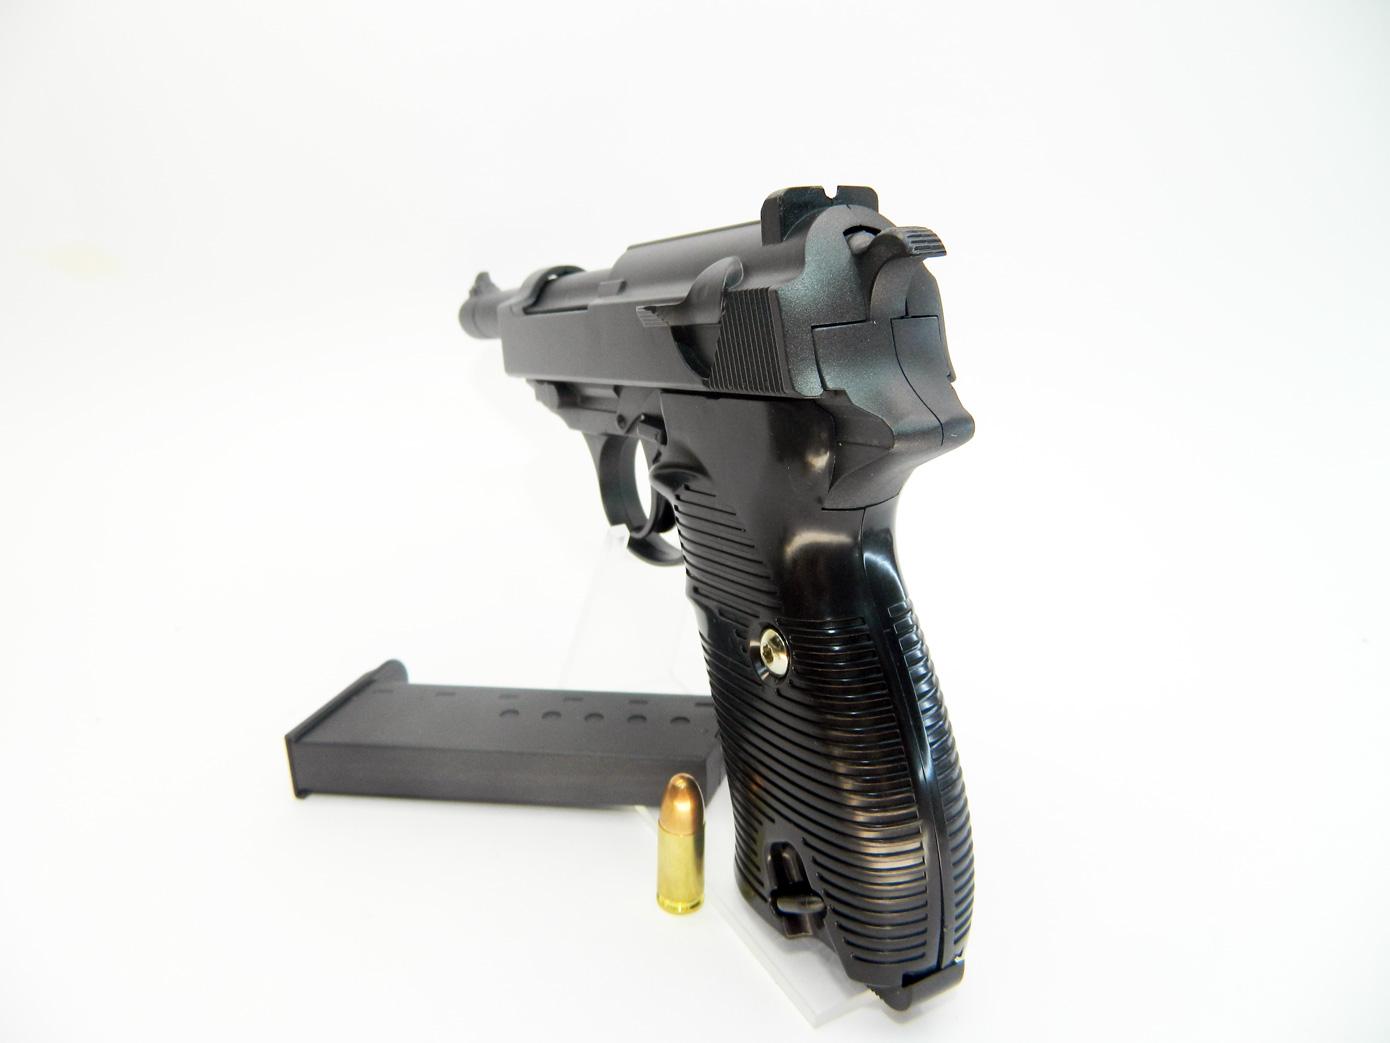 Walther P38 масштаб 1:1 изображение 0